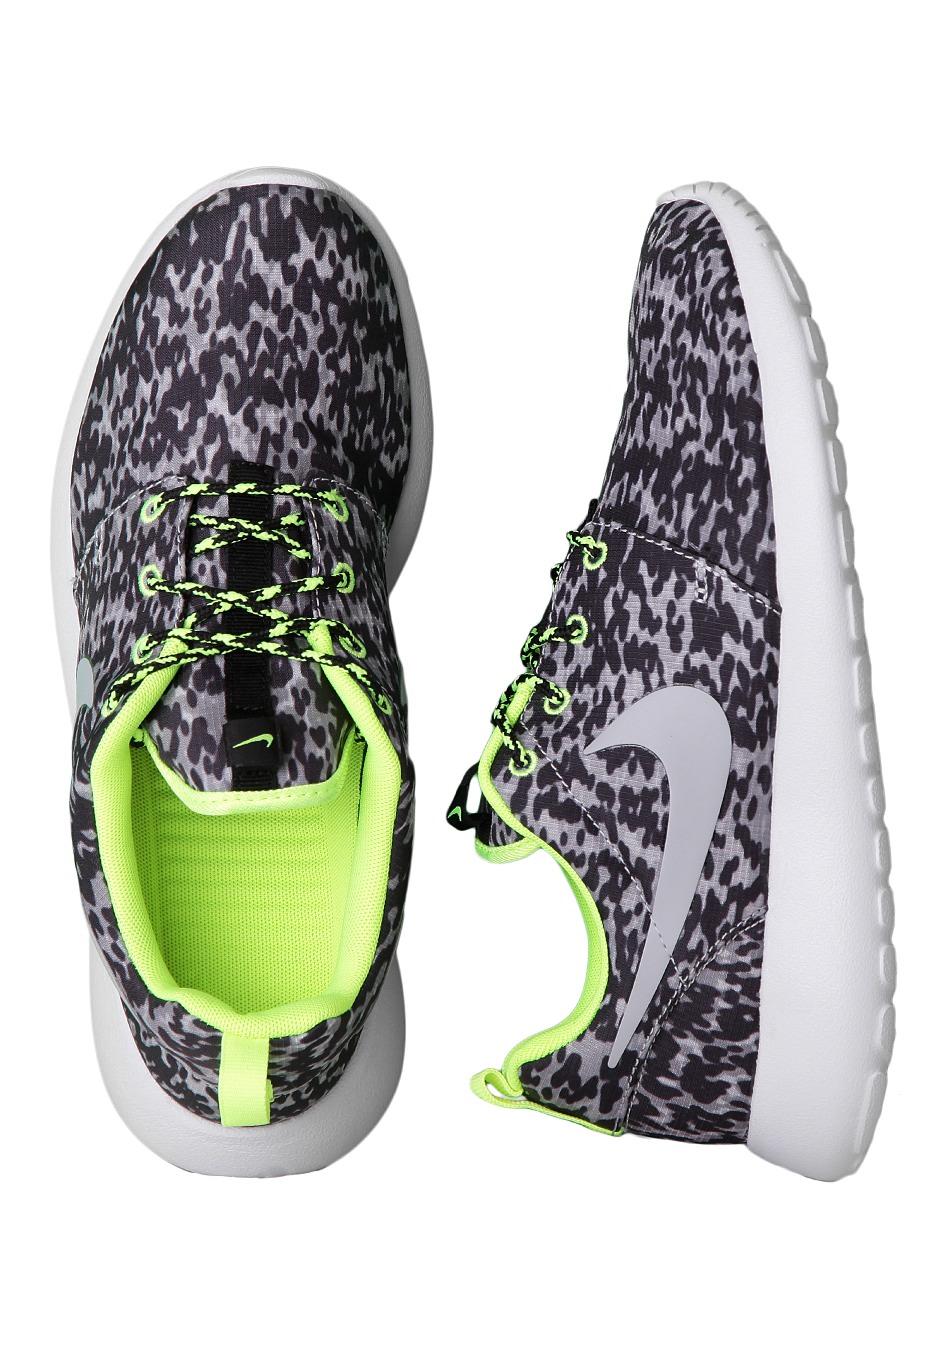 Nike - Roshe Run Print Cool Grey Wolf Grey Volt Black - Girl Shoes -  Impericon.com Worldwide 5a17b19bb080